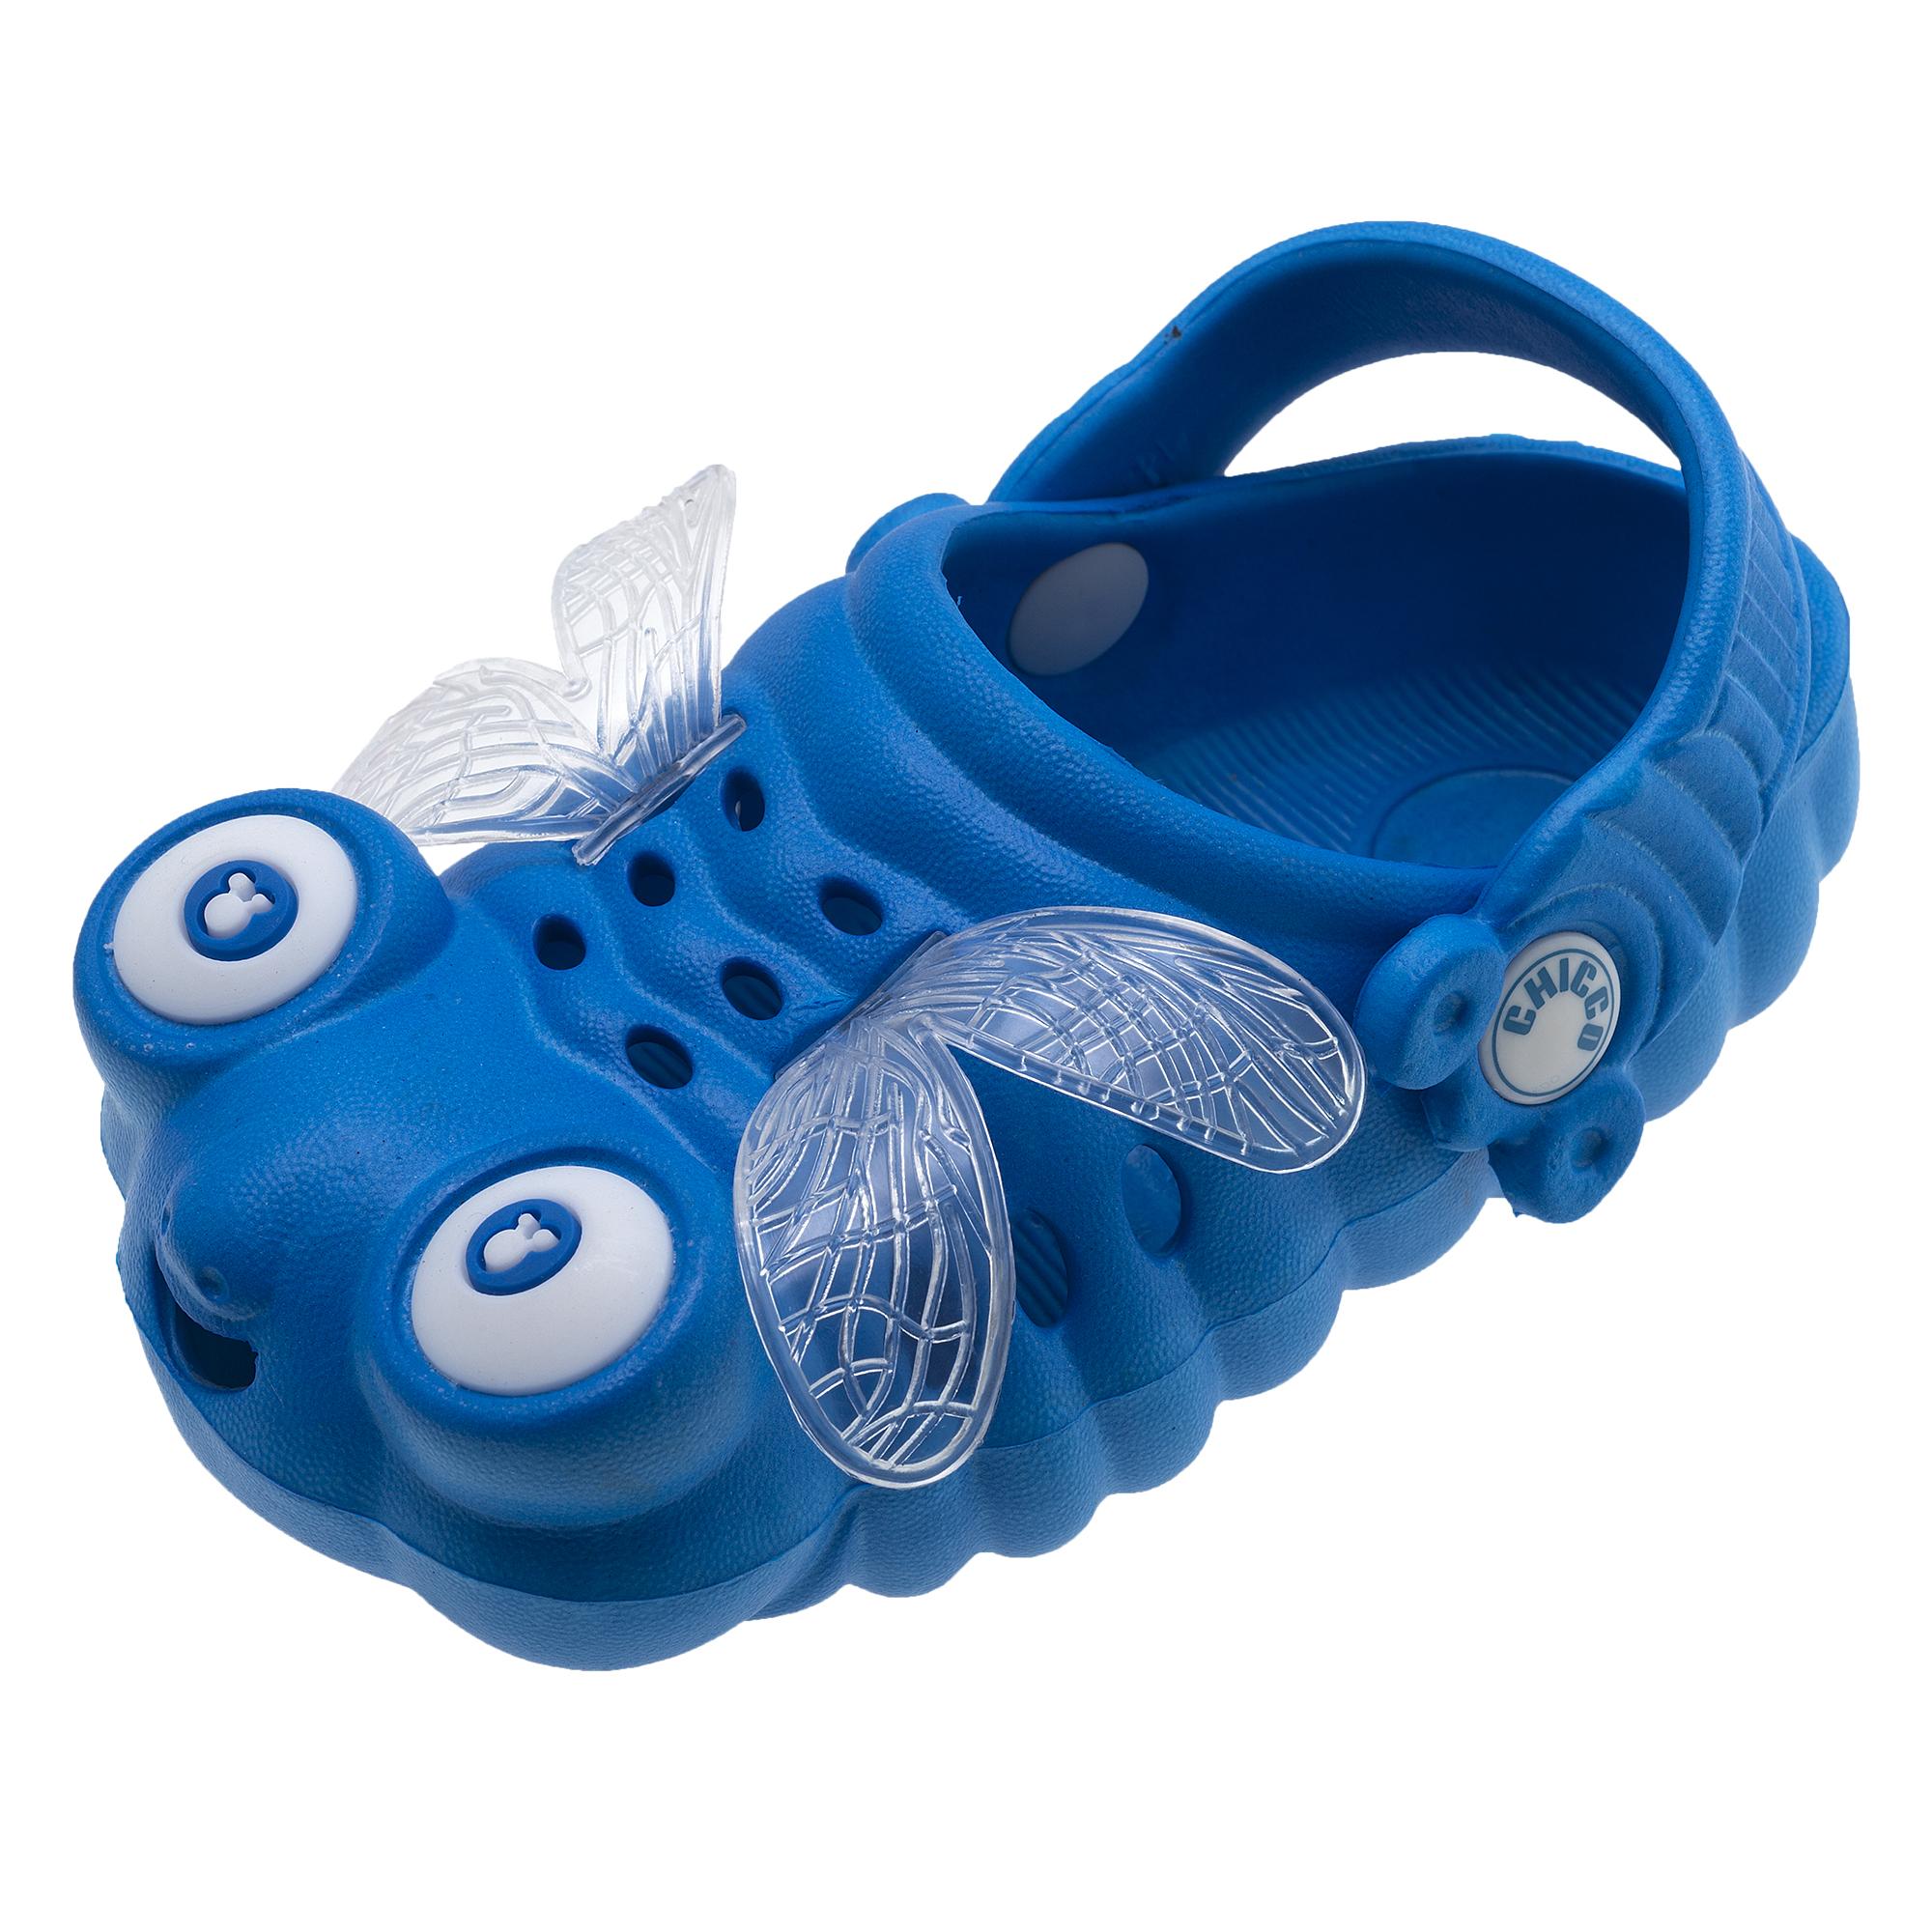 Papuci Copii Chicco Minorca, Bleumarin, 63741 imagine